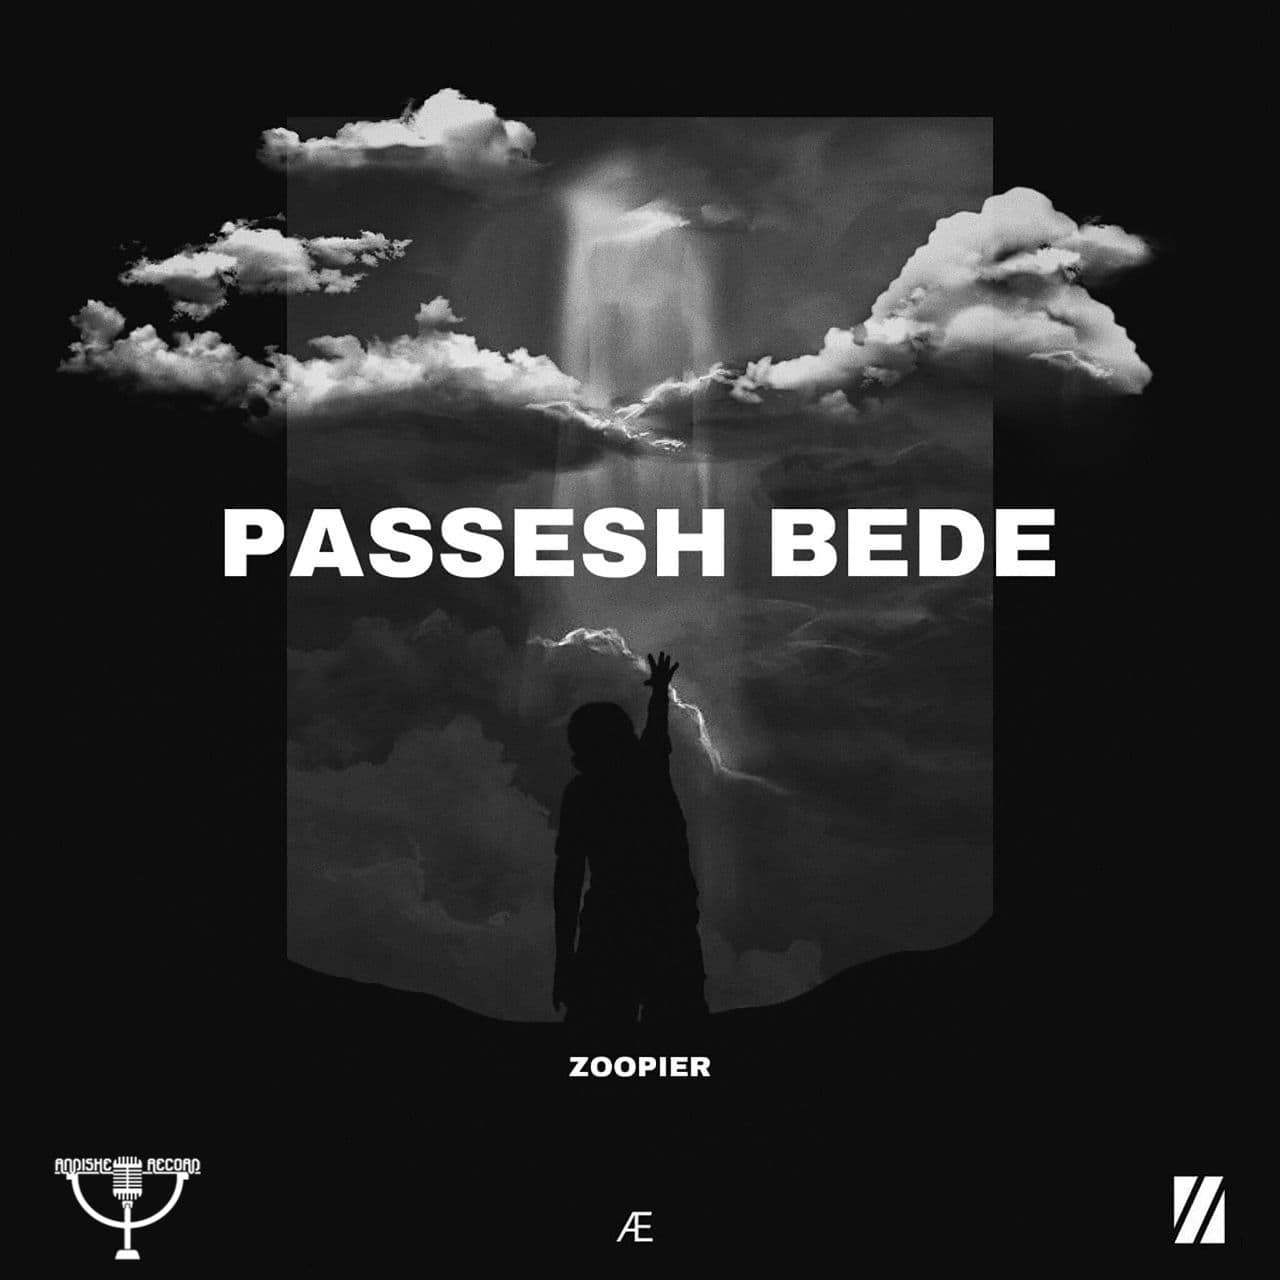 Zoopier - Pasesh Bede